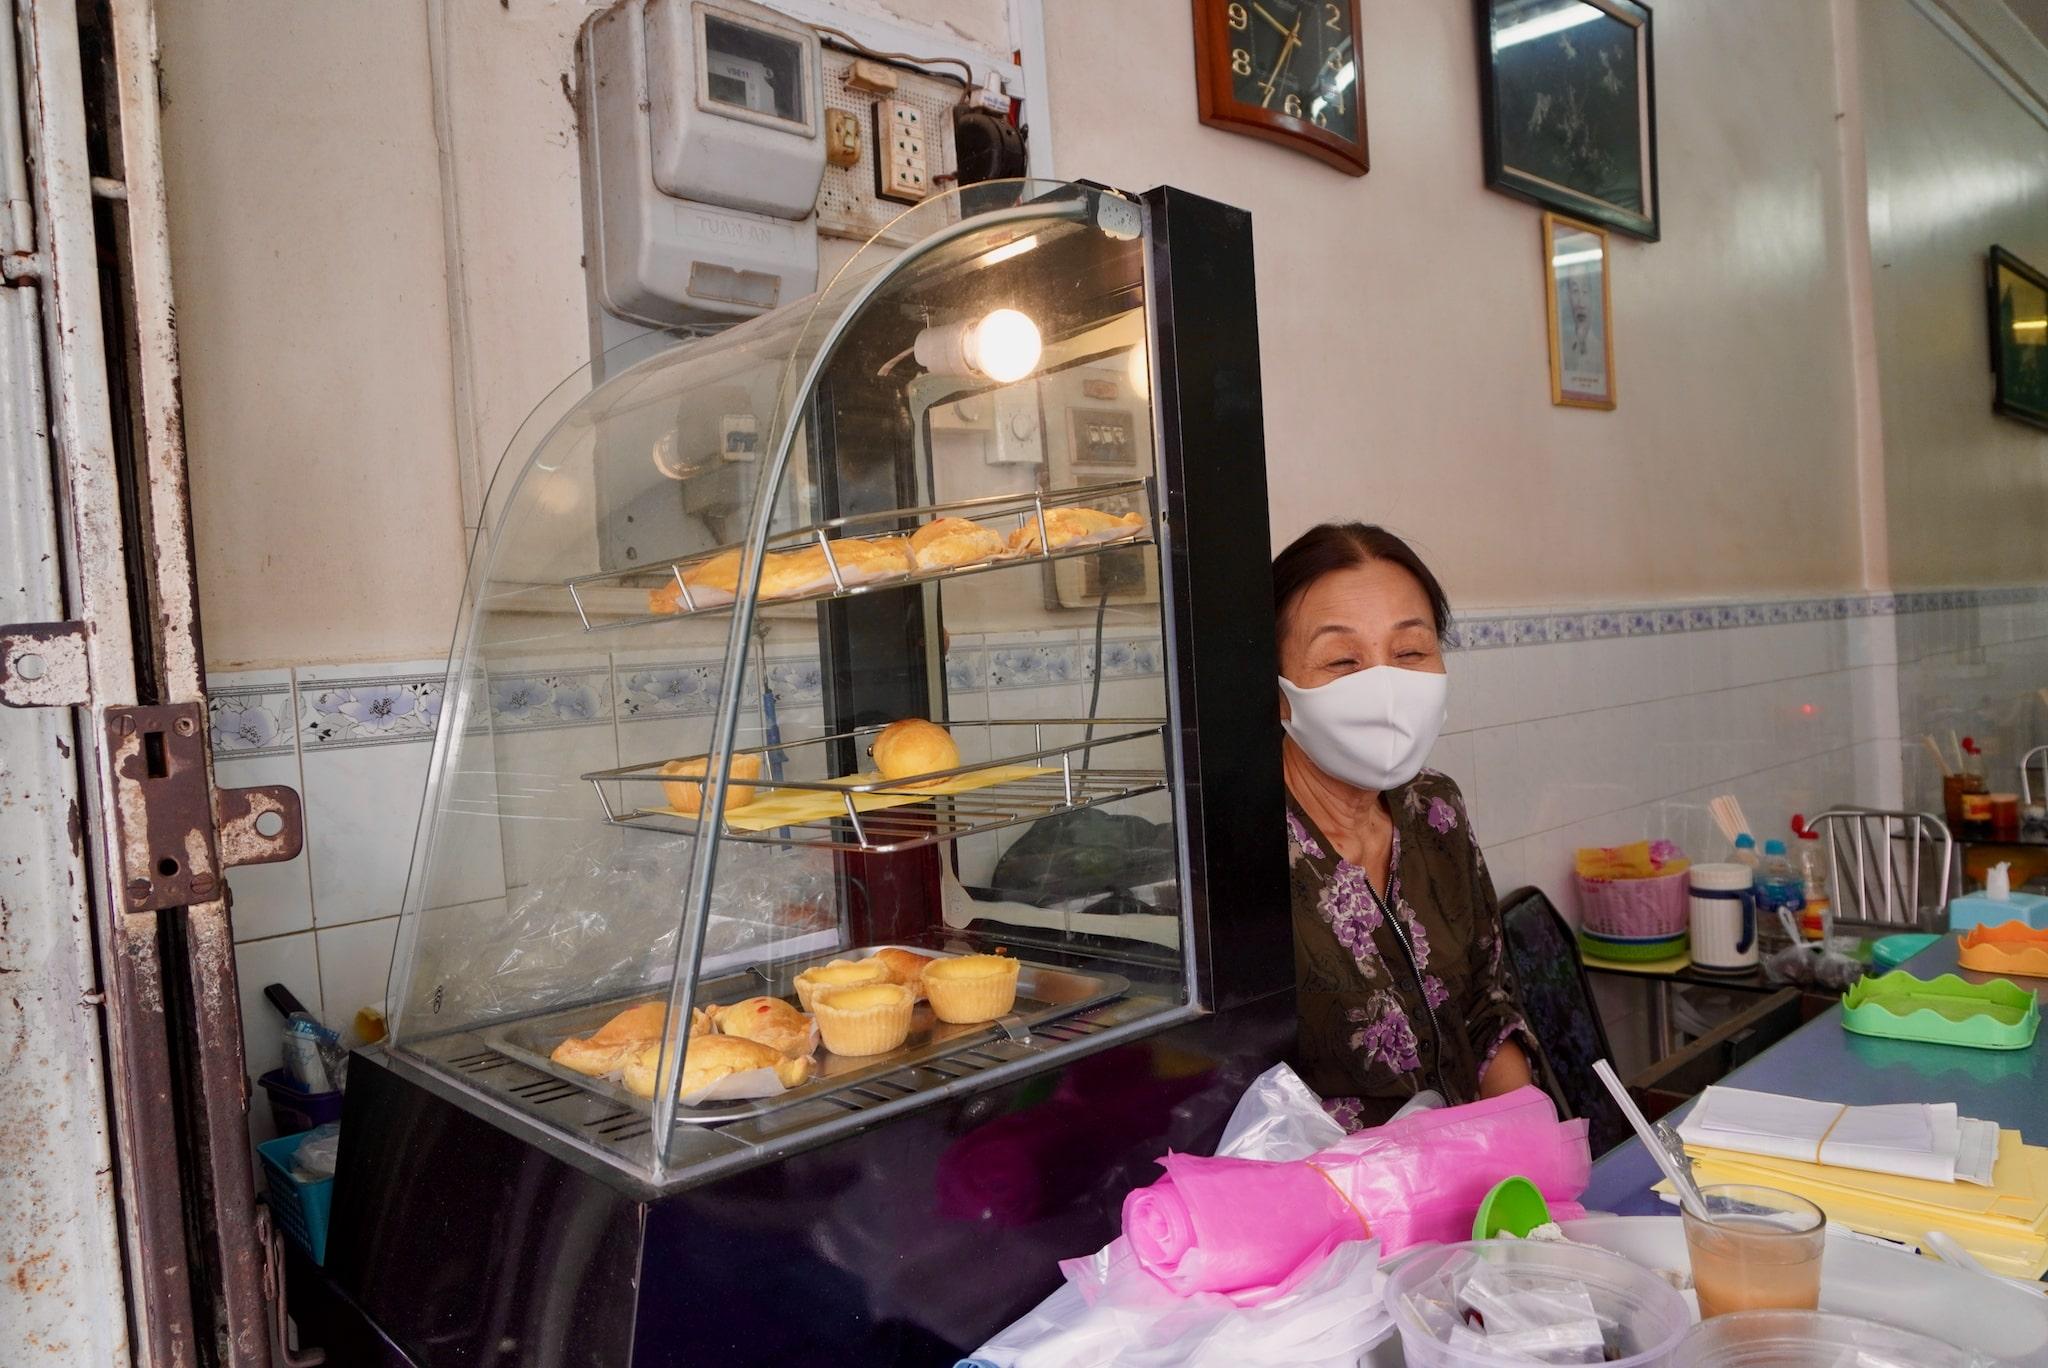 Ms. Sau runs the till at Nam Vien eatery in Long Xuyen City. Photo: Xuan Tung / Tuoi Tre